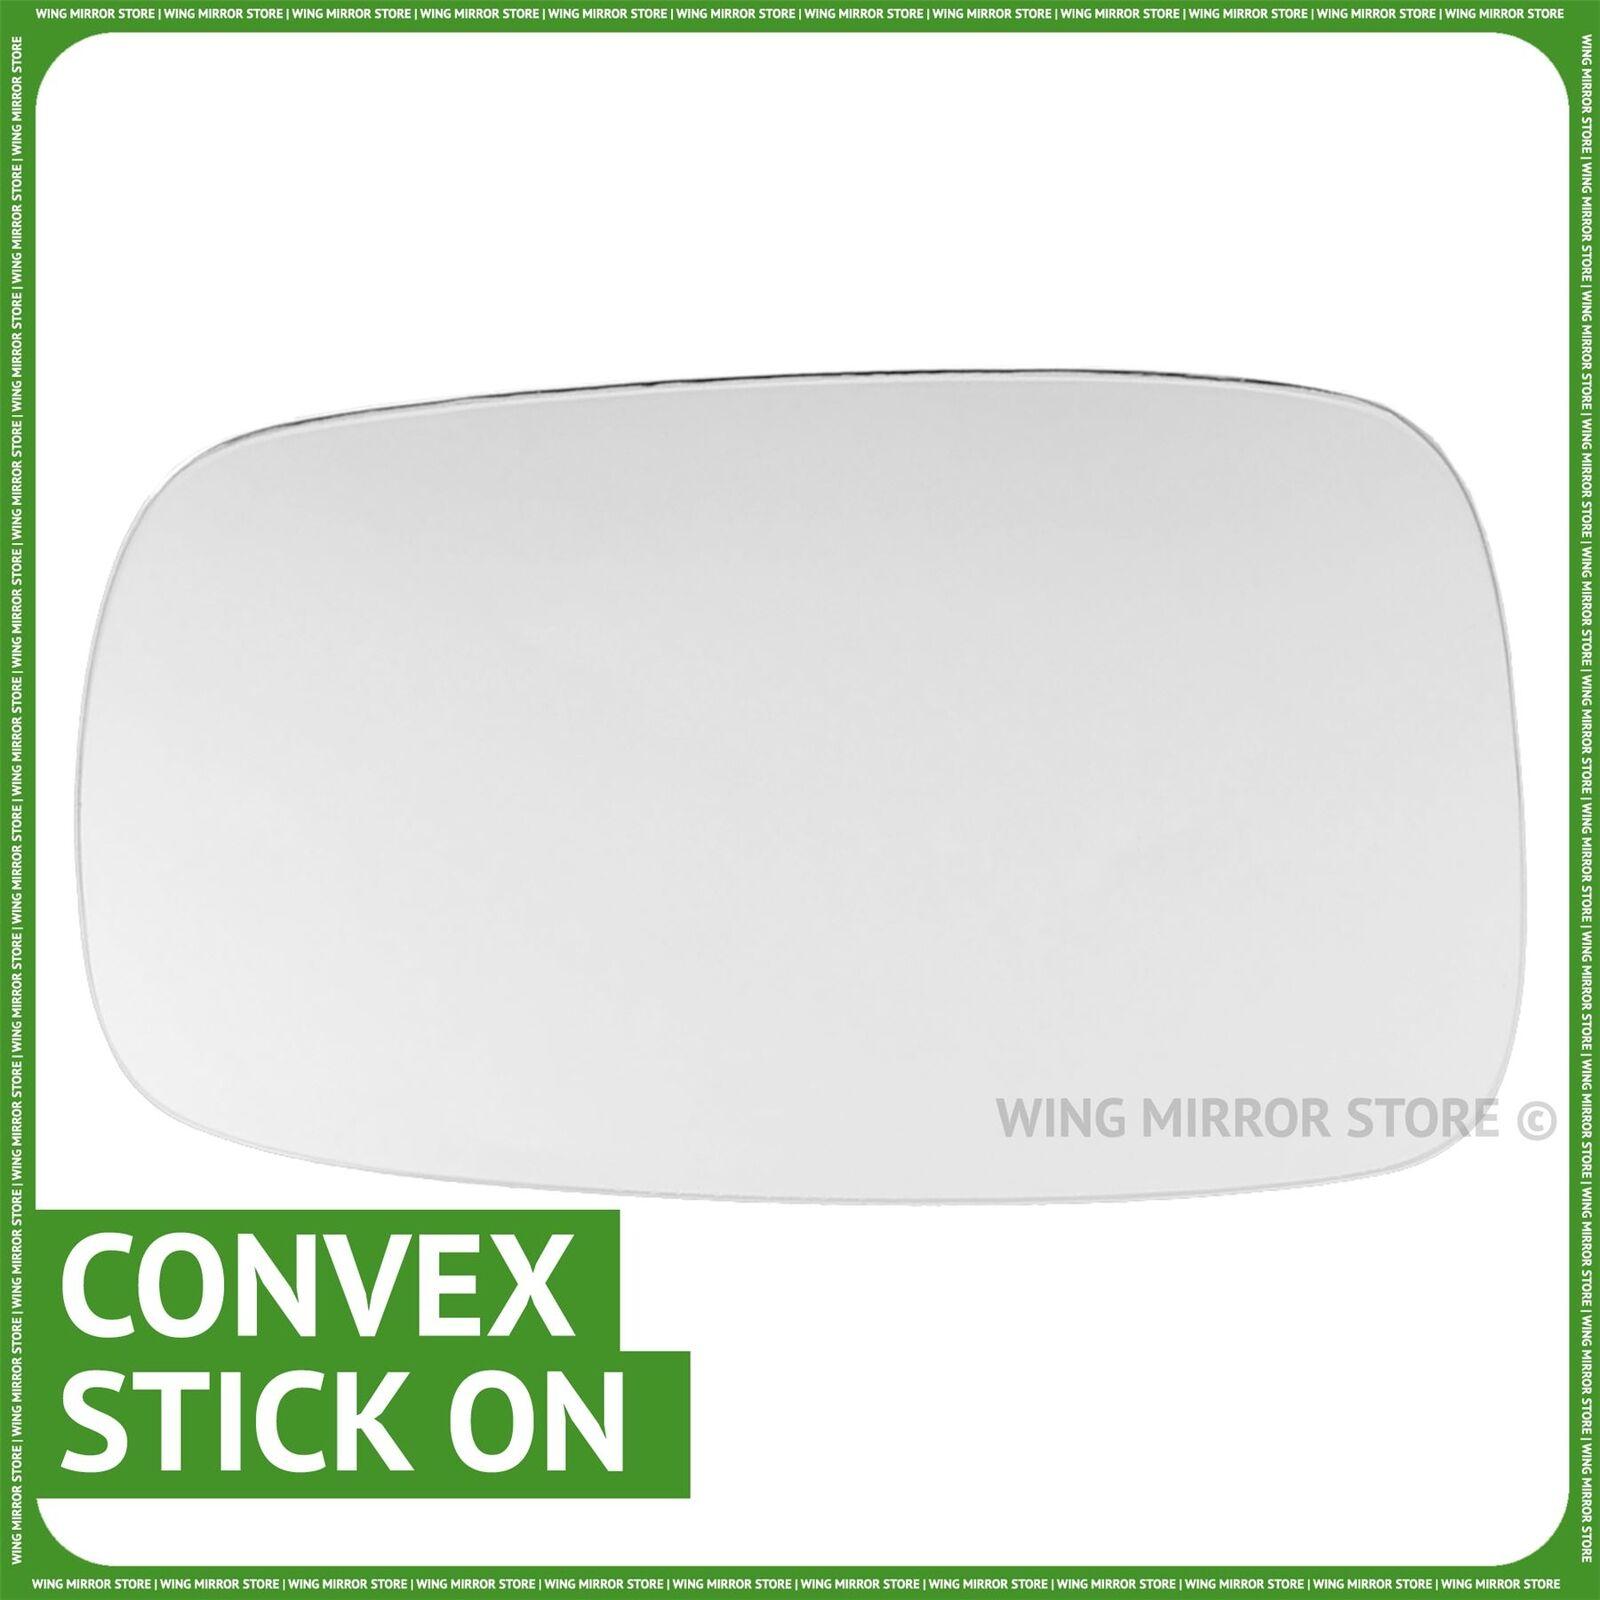 RENAULT SCENIC MK2 2003-2009 DOOR WING MIRROR GLASS CONVEX RIGHT OR LEFT